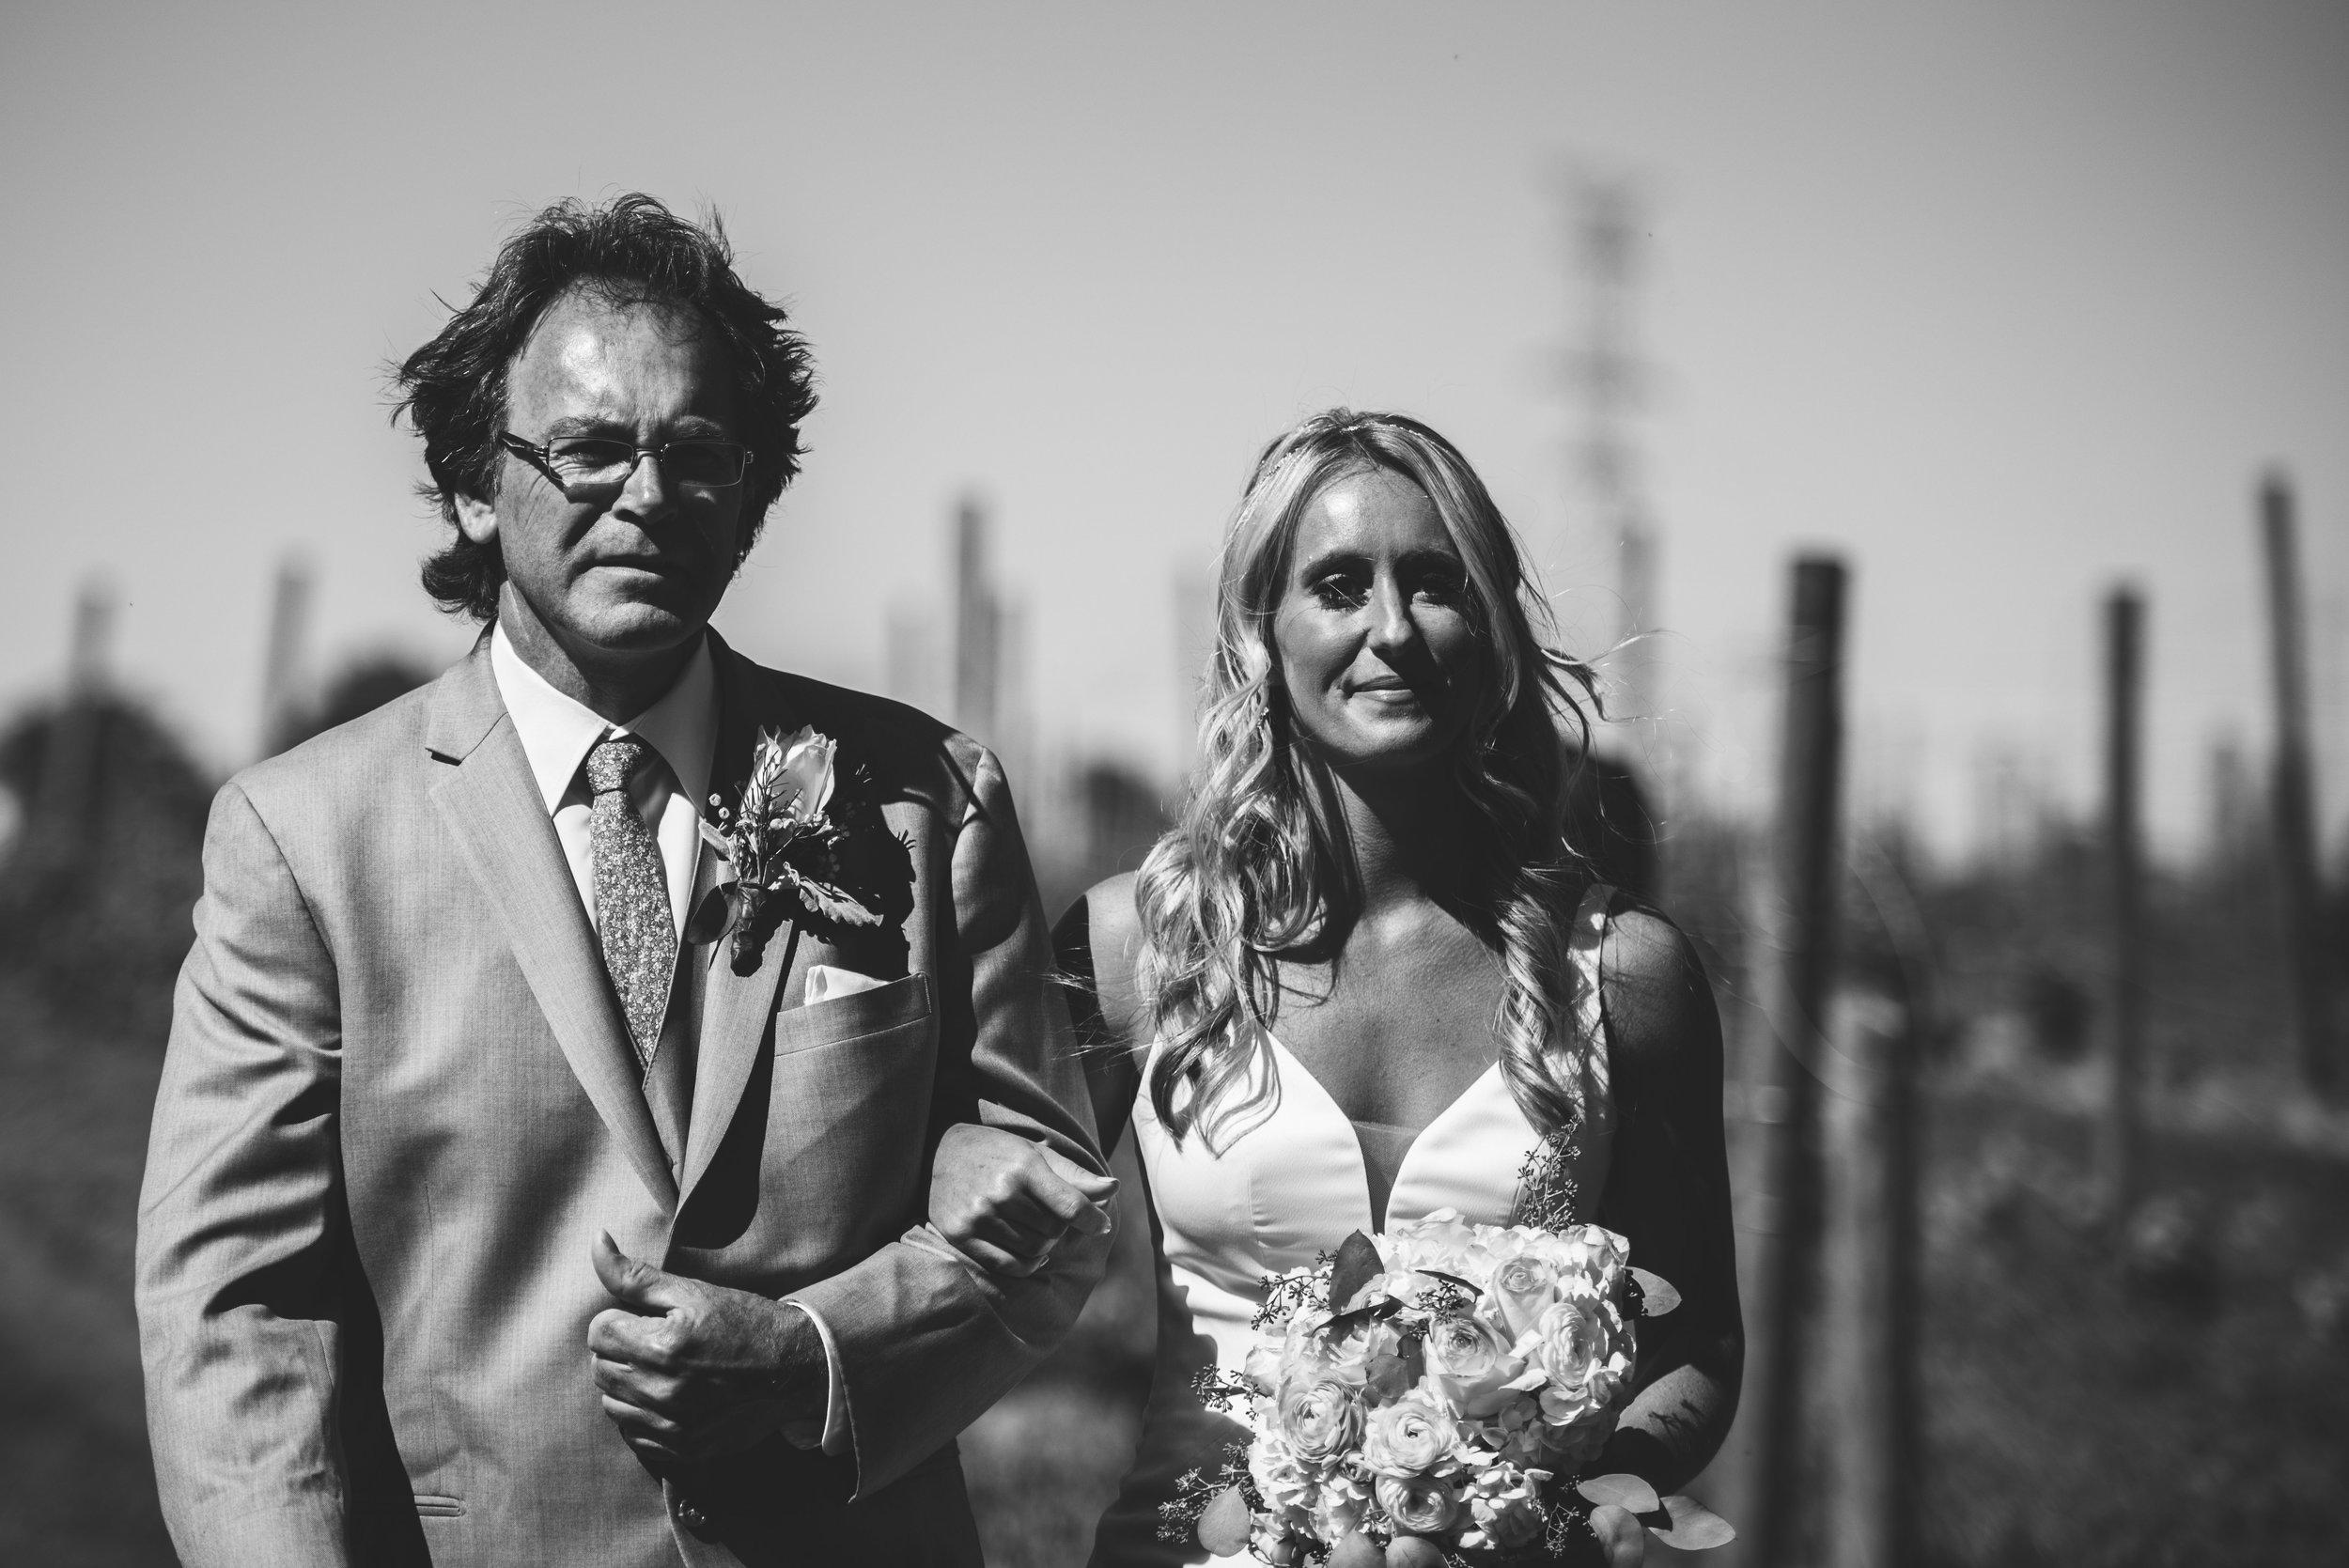 sandusky ohio wedding photography-23.jpg